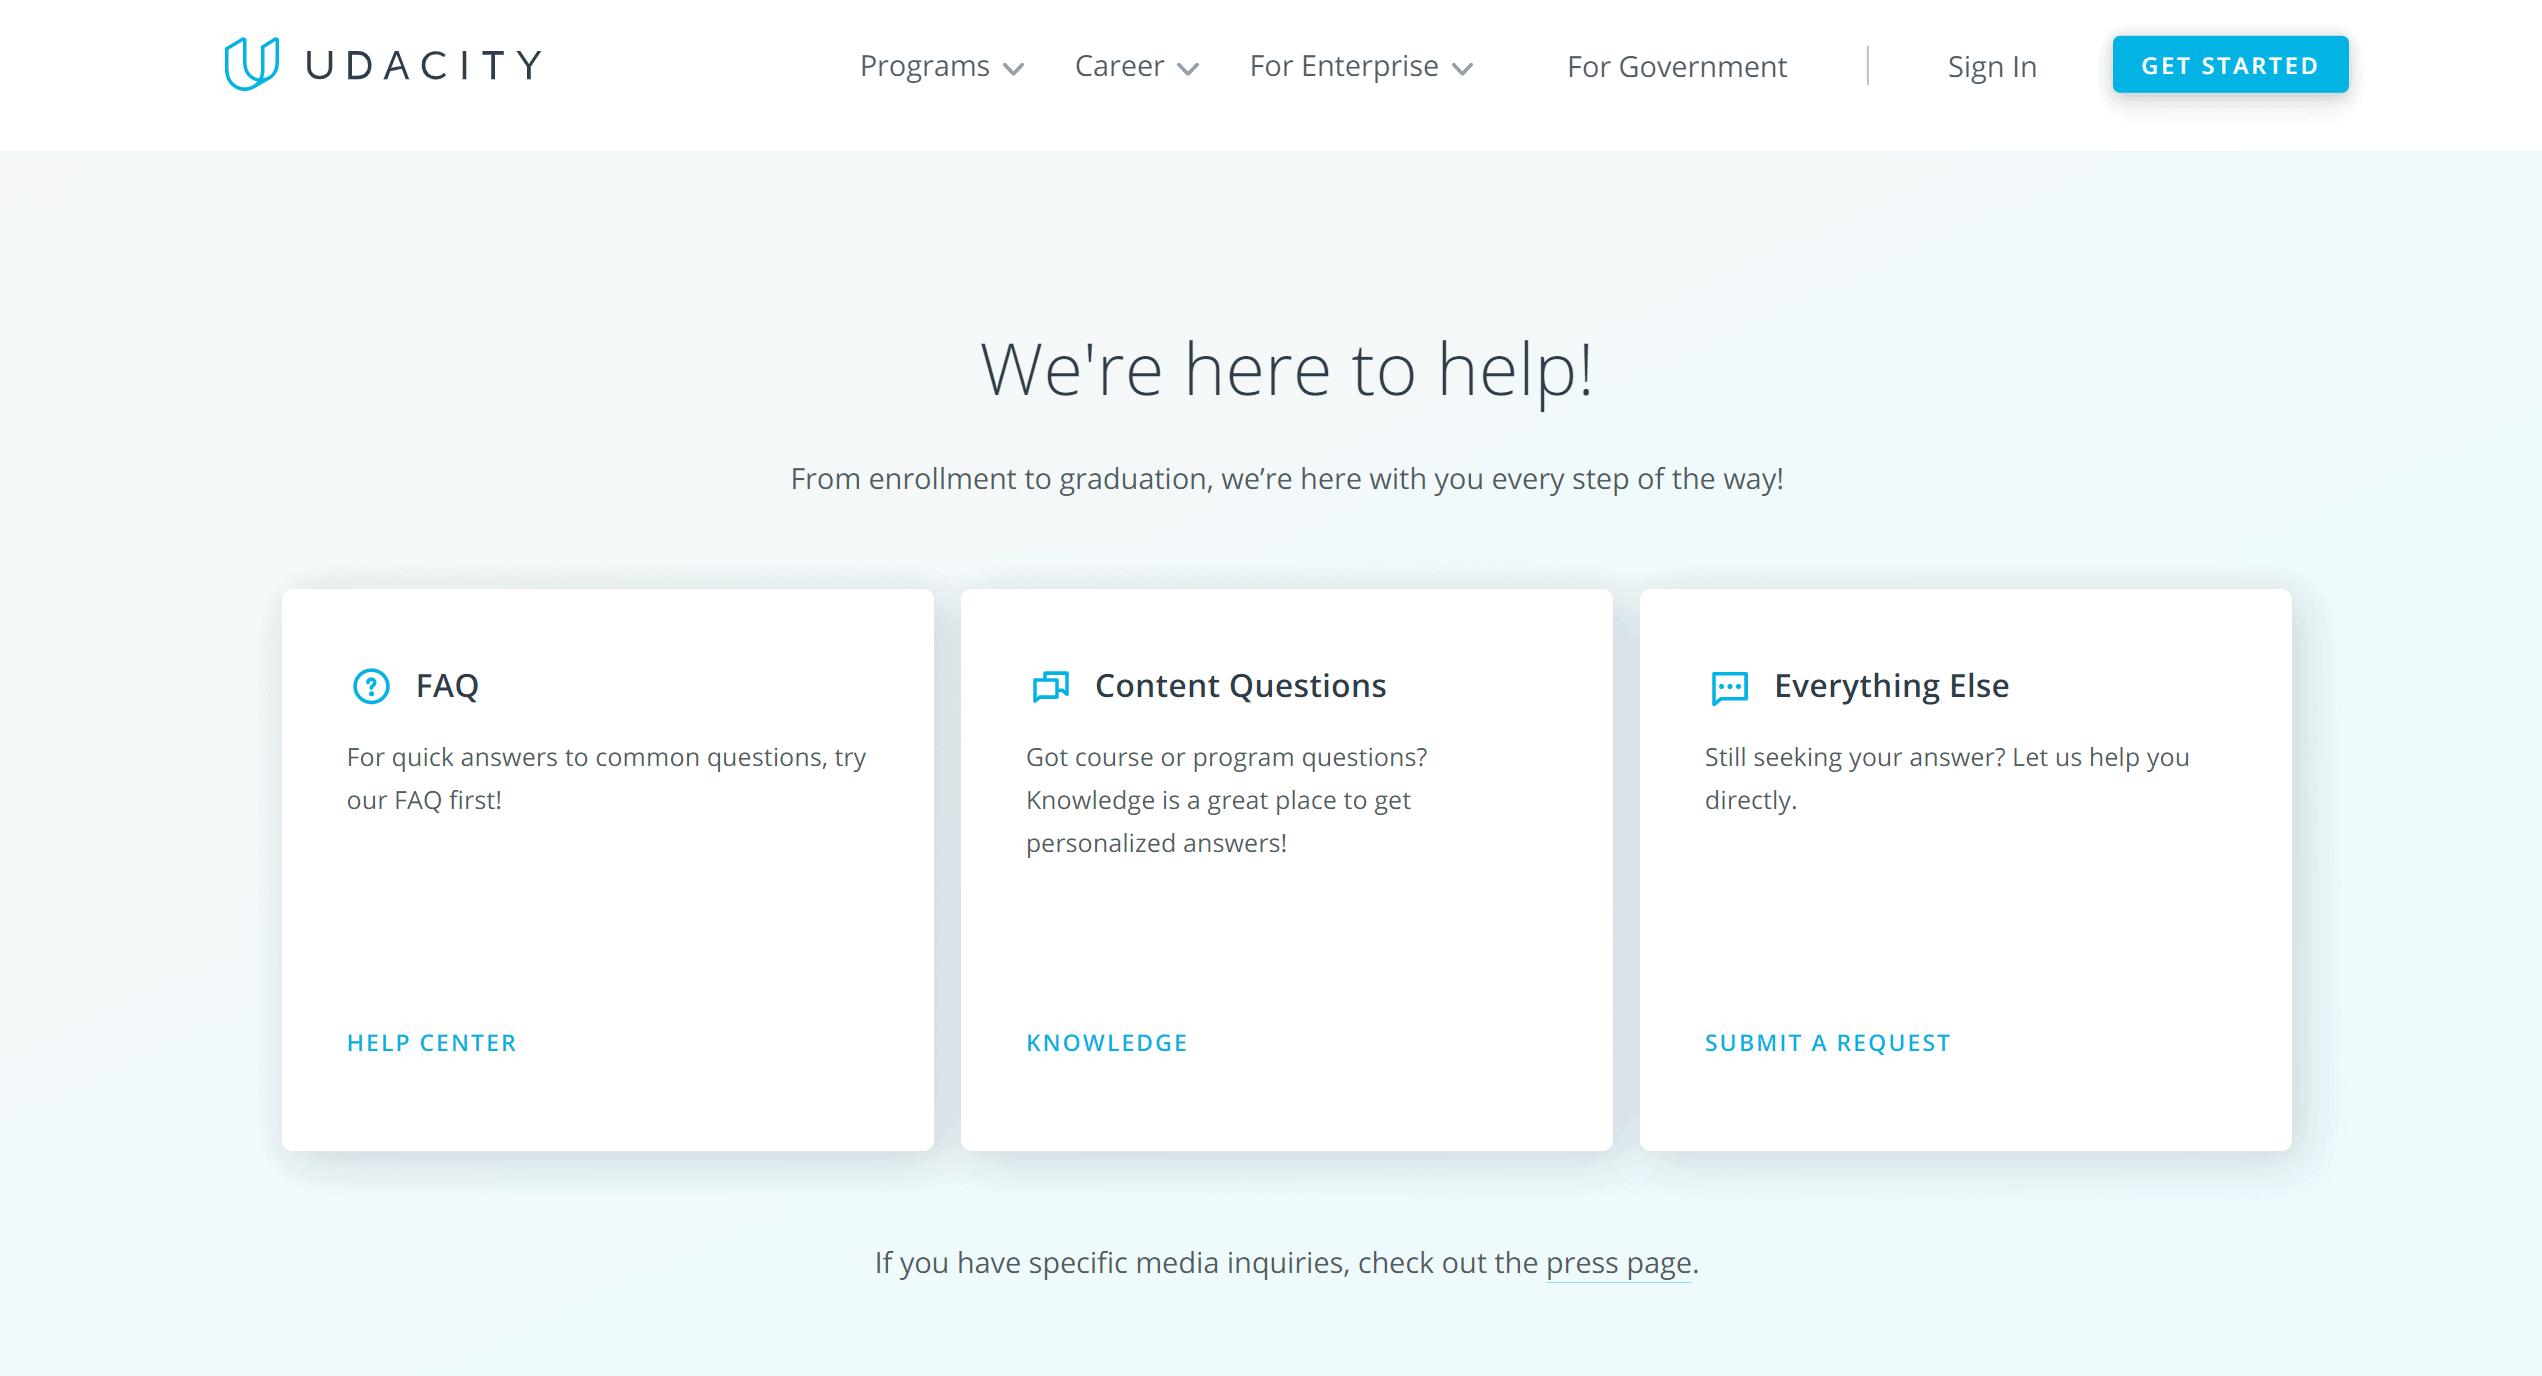 Udacity support